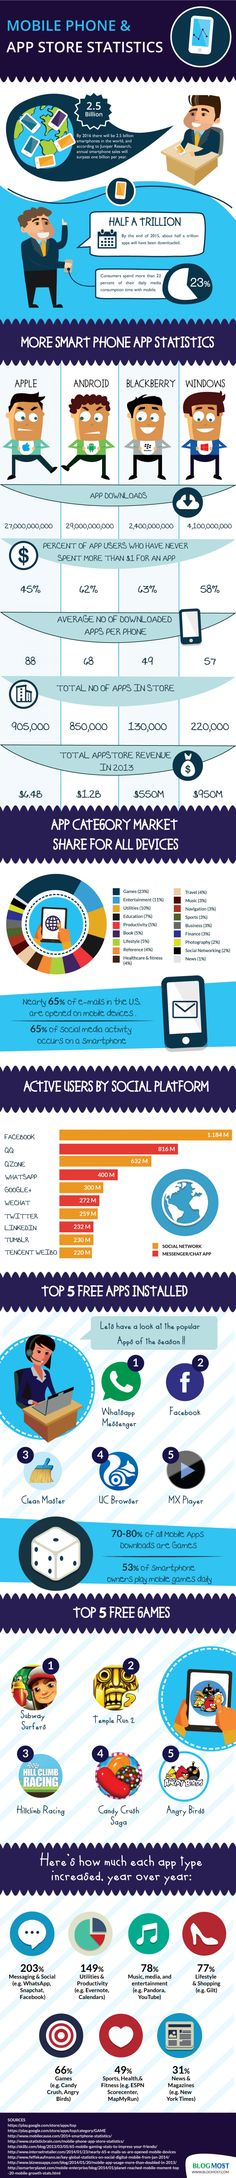 #Mobile Phone & #App Store Statistics #Infographic